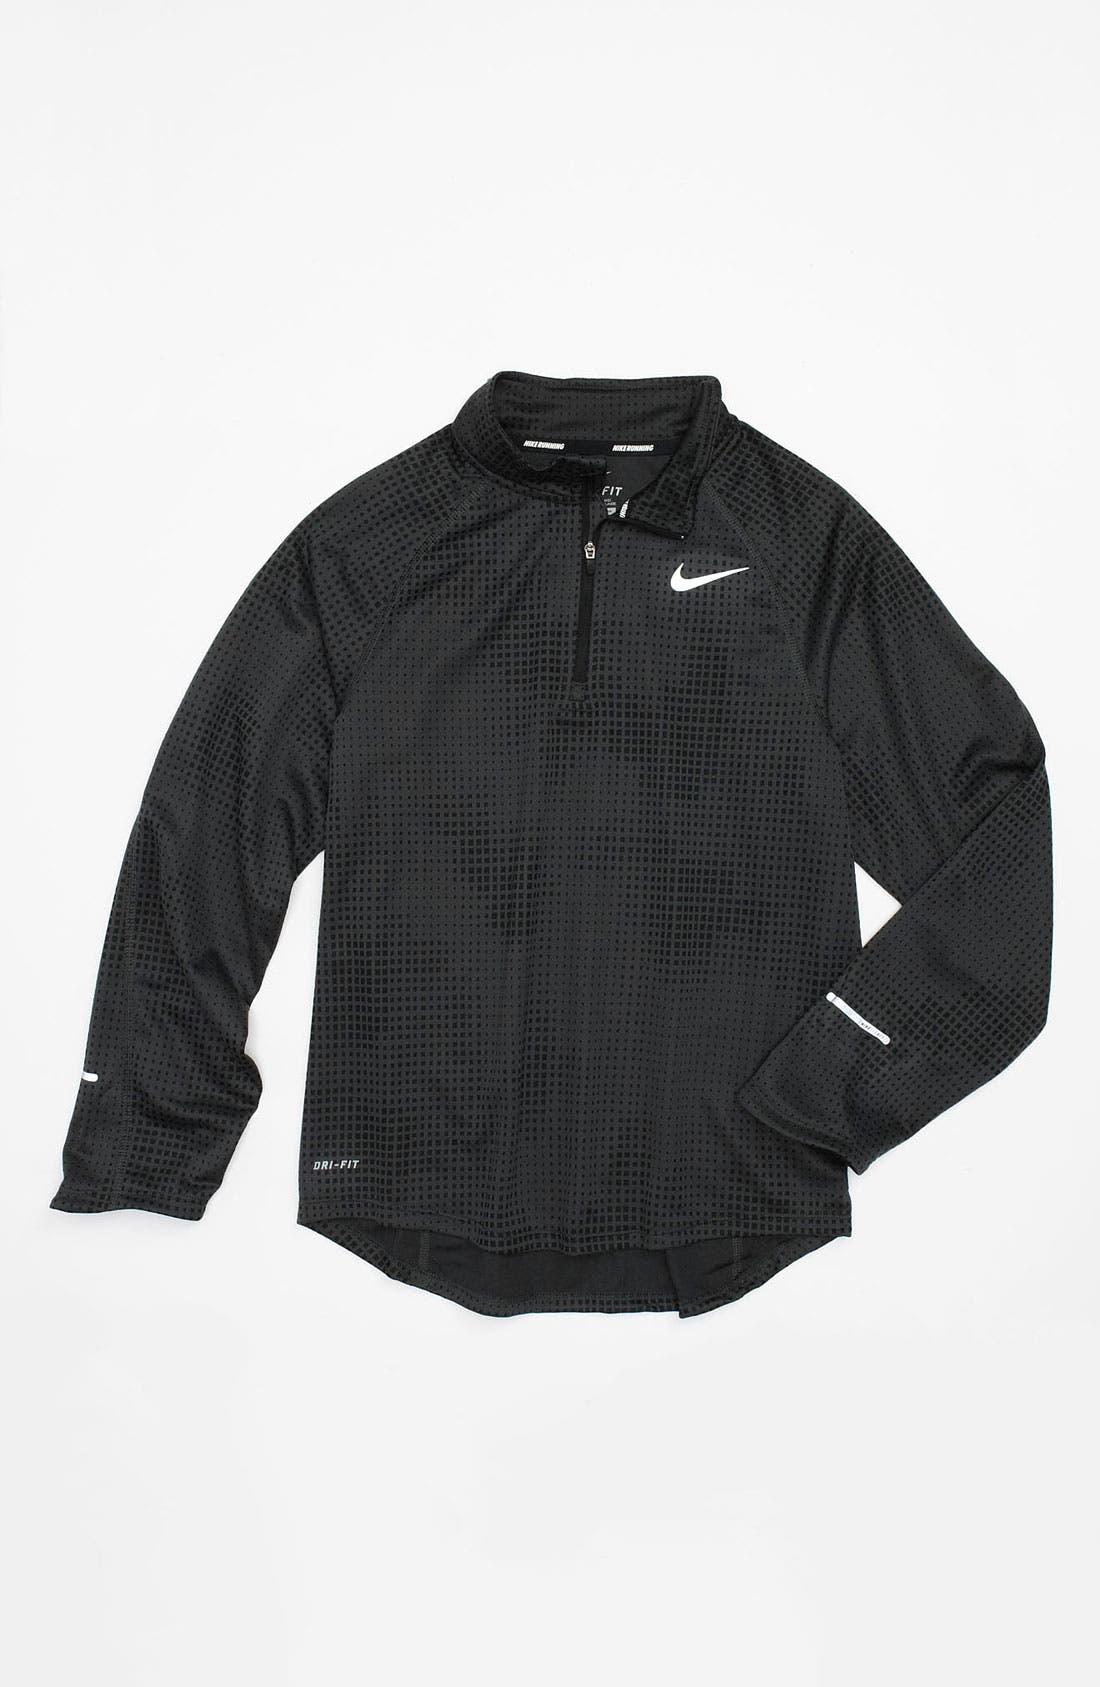 Alternate Image 1 Selected - Nike 'Element' Half Zip Pullover (Big Boys)